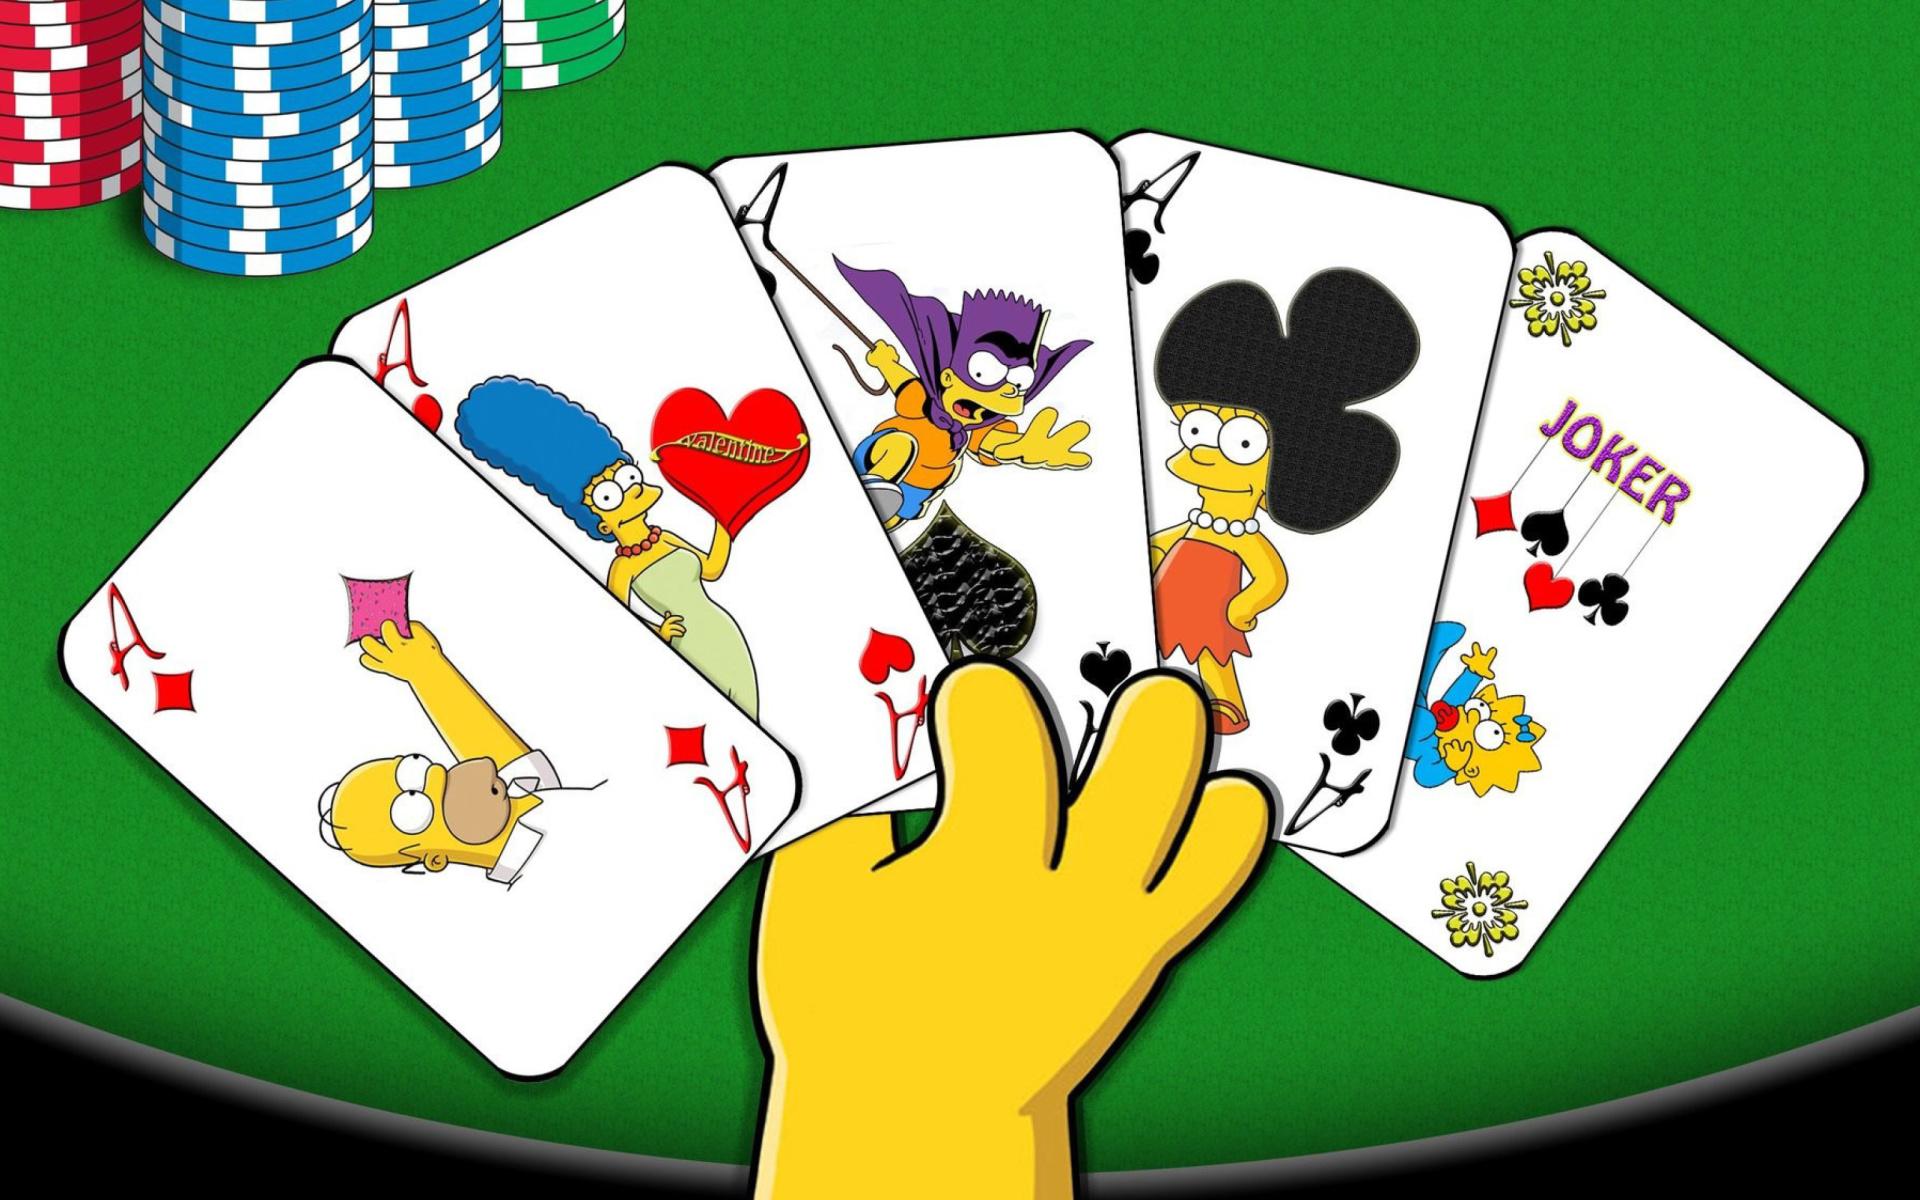 Simpsons poker